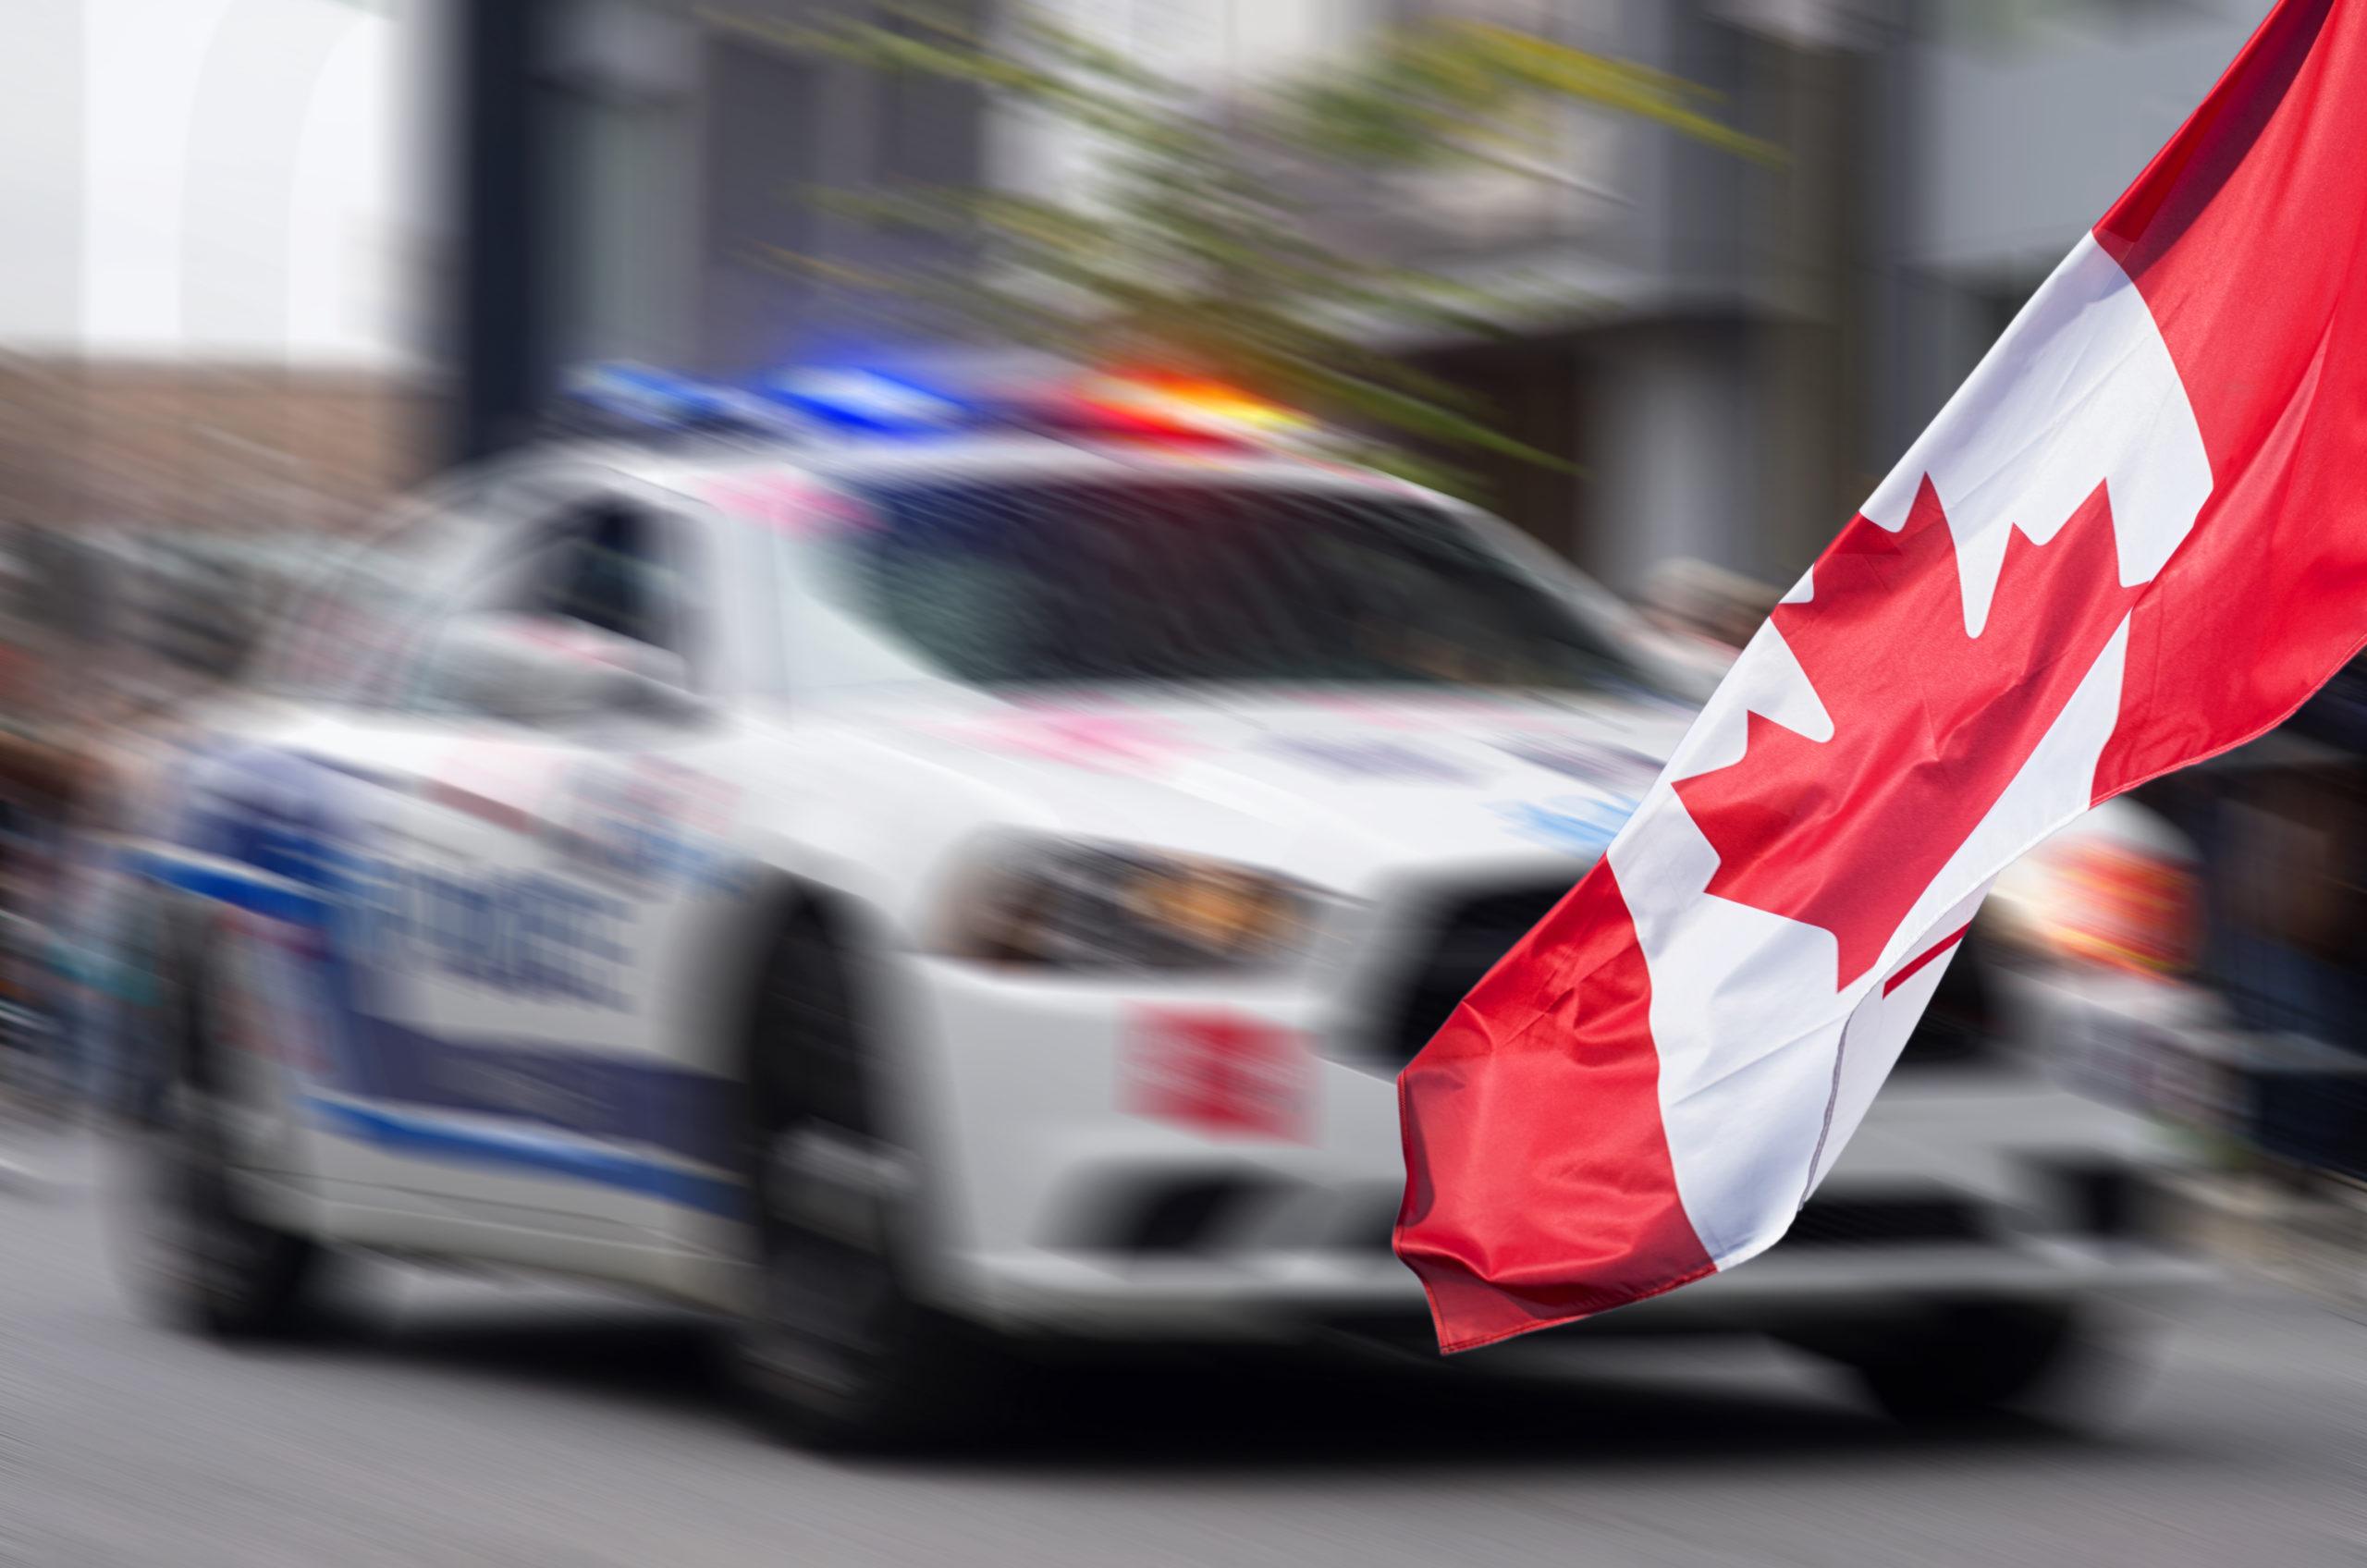 Rechtsextreme Auto-Attacke in Kanada: Vier Muslime tot (c)shutterstock, bearbeitet by iQ